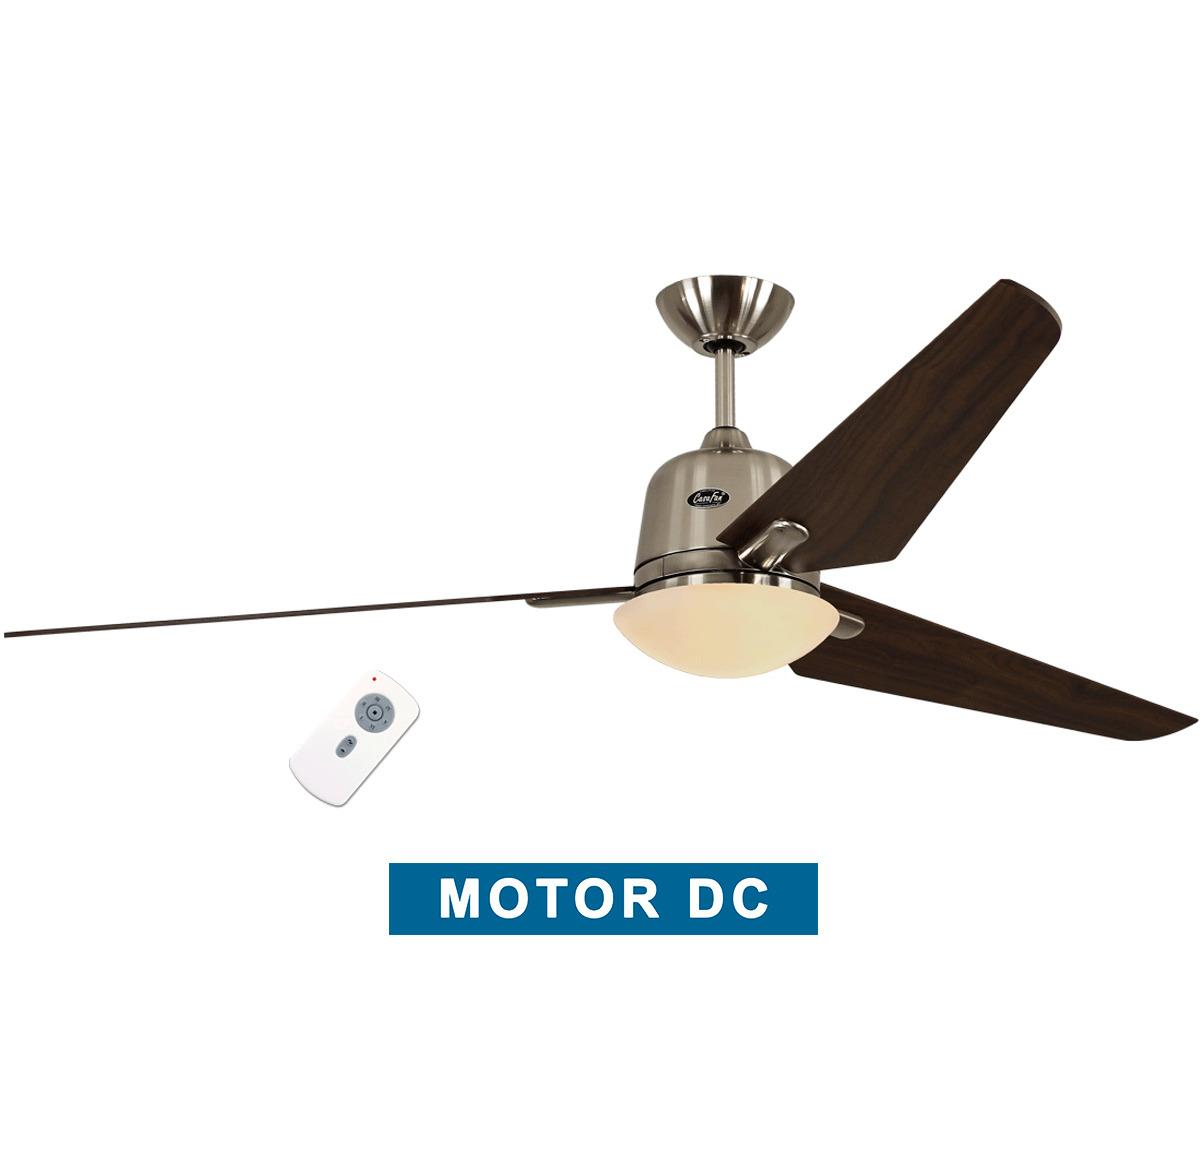 Ceiling fan with light CasaFan 516089 ECO AVIATOS 162 walnut / satin...